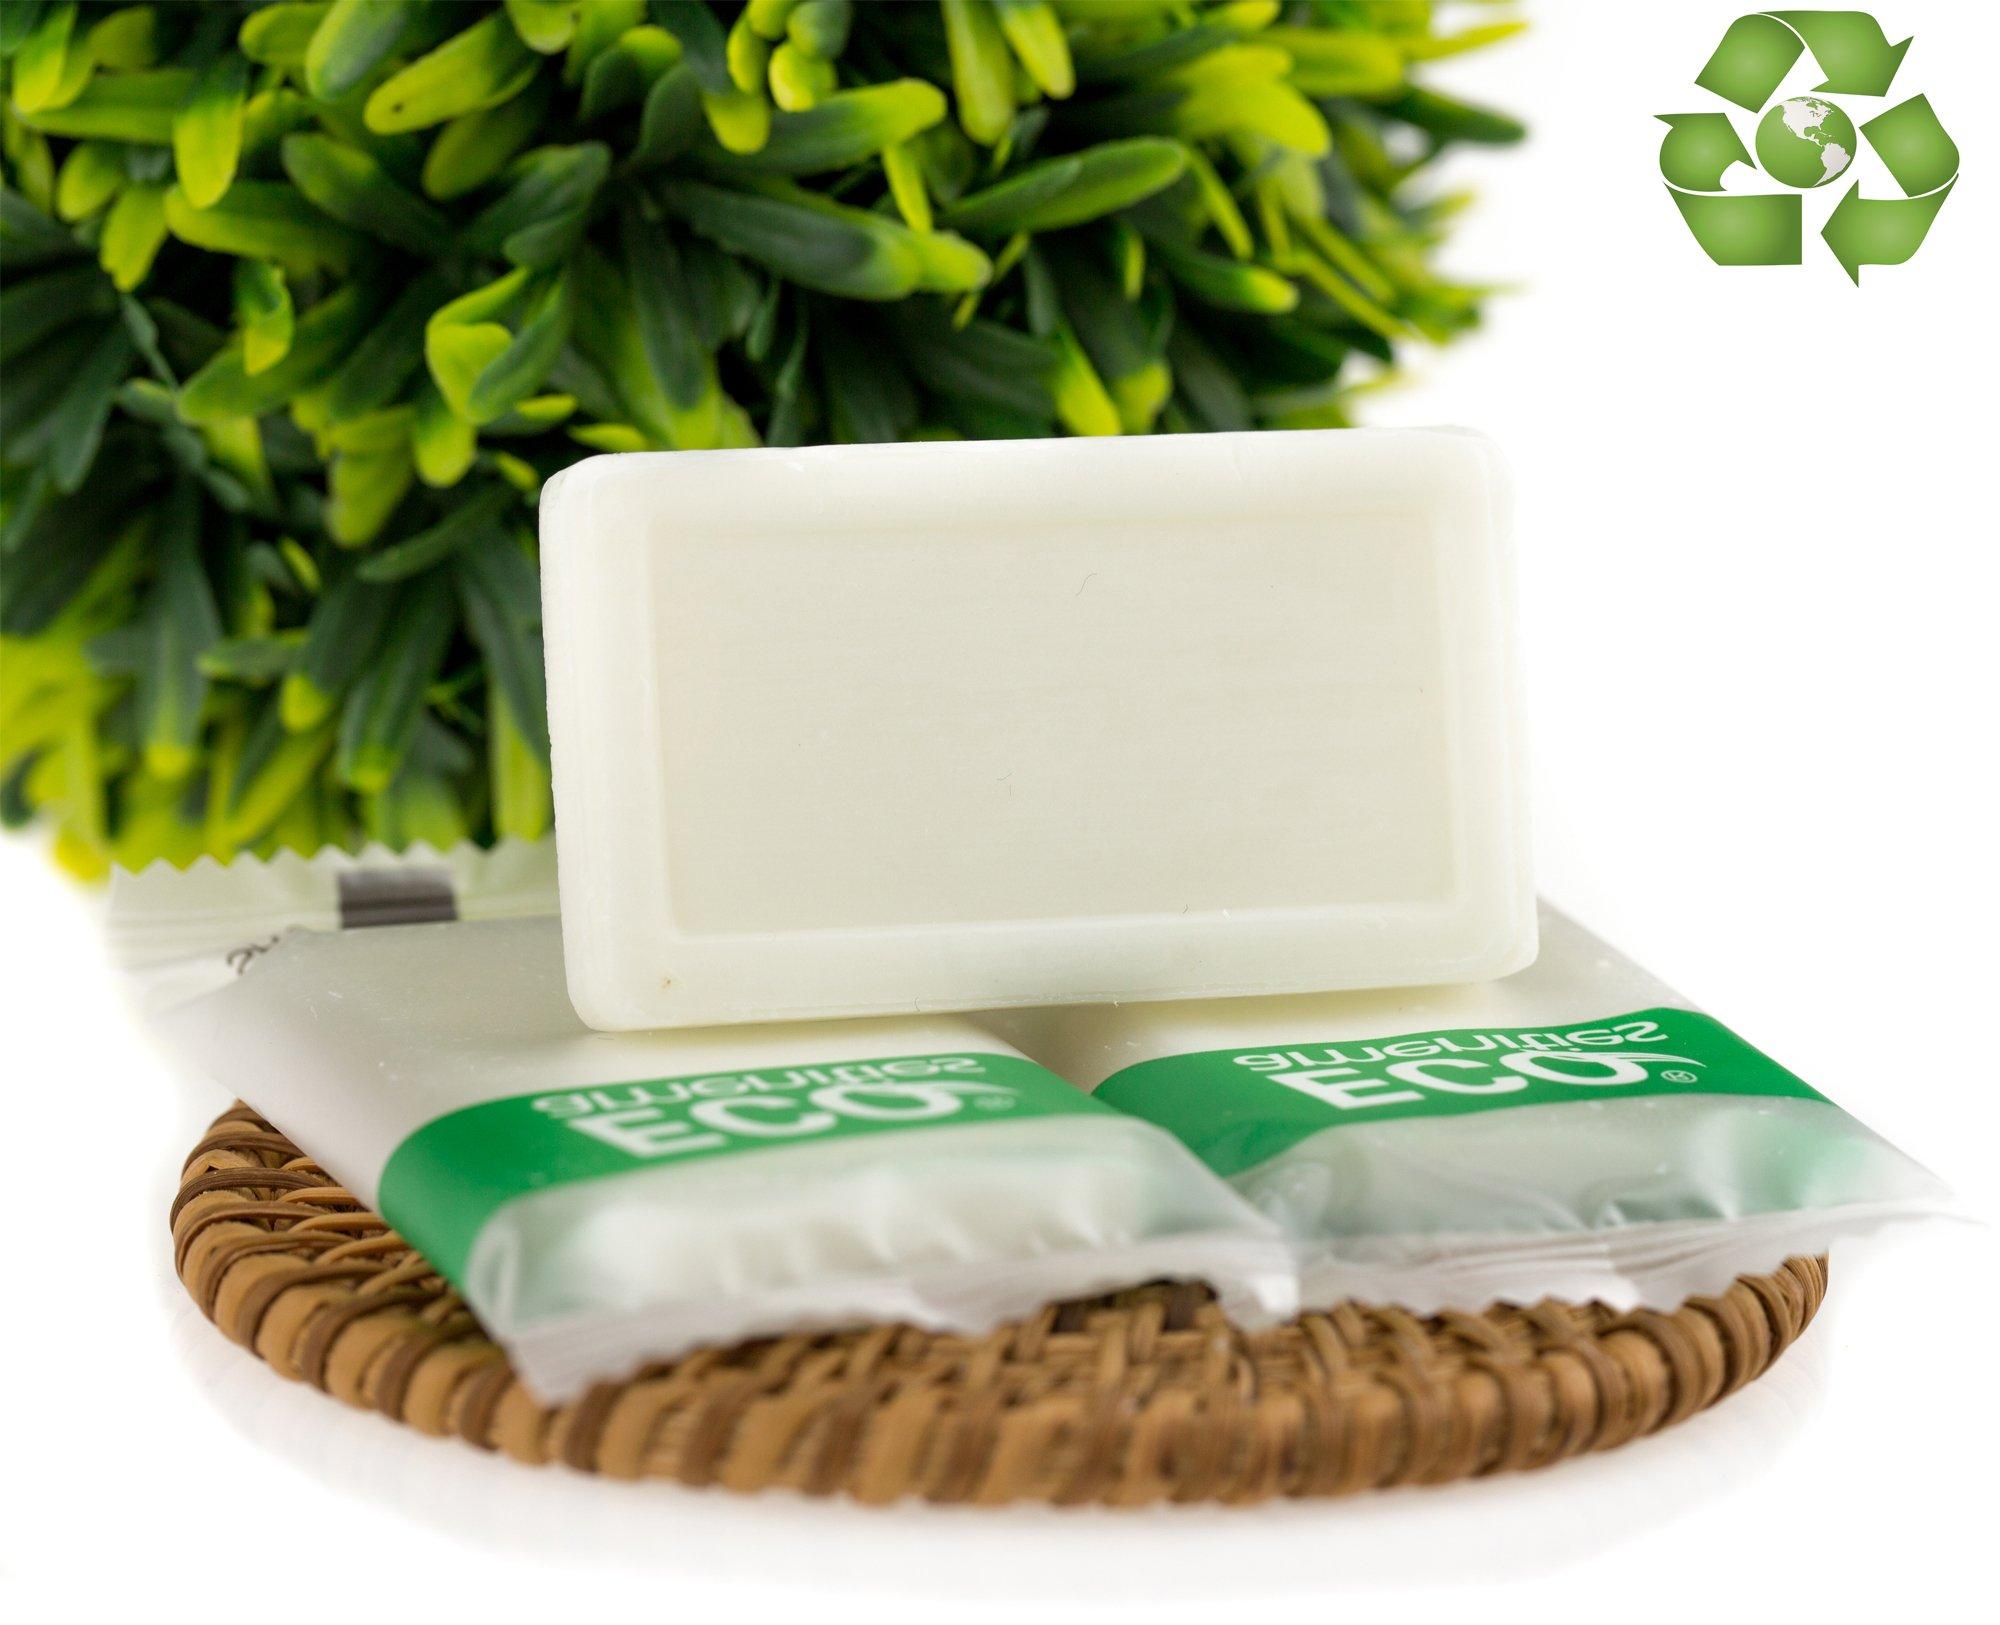 ECO AMENITIES Travel Size Soap - bar